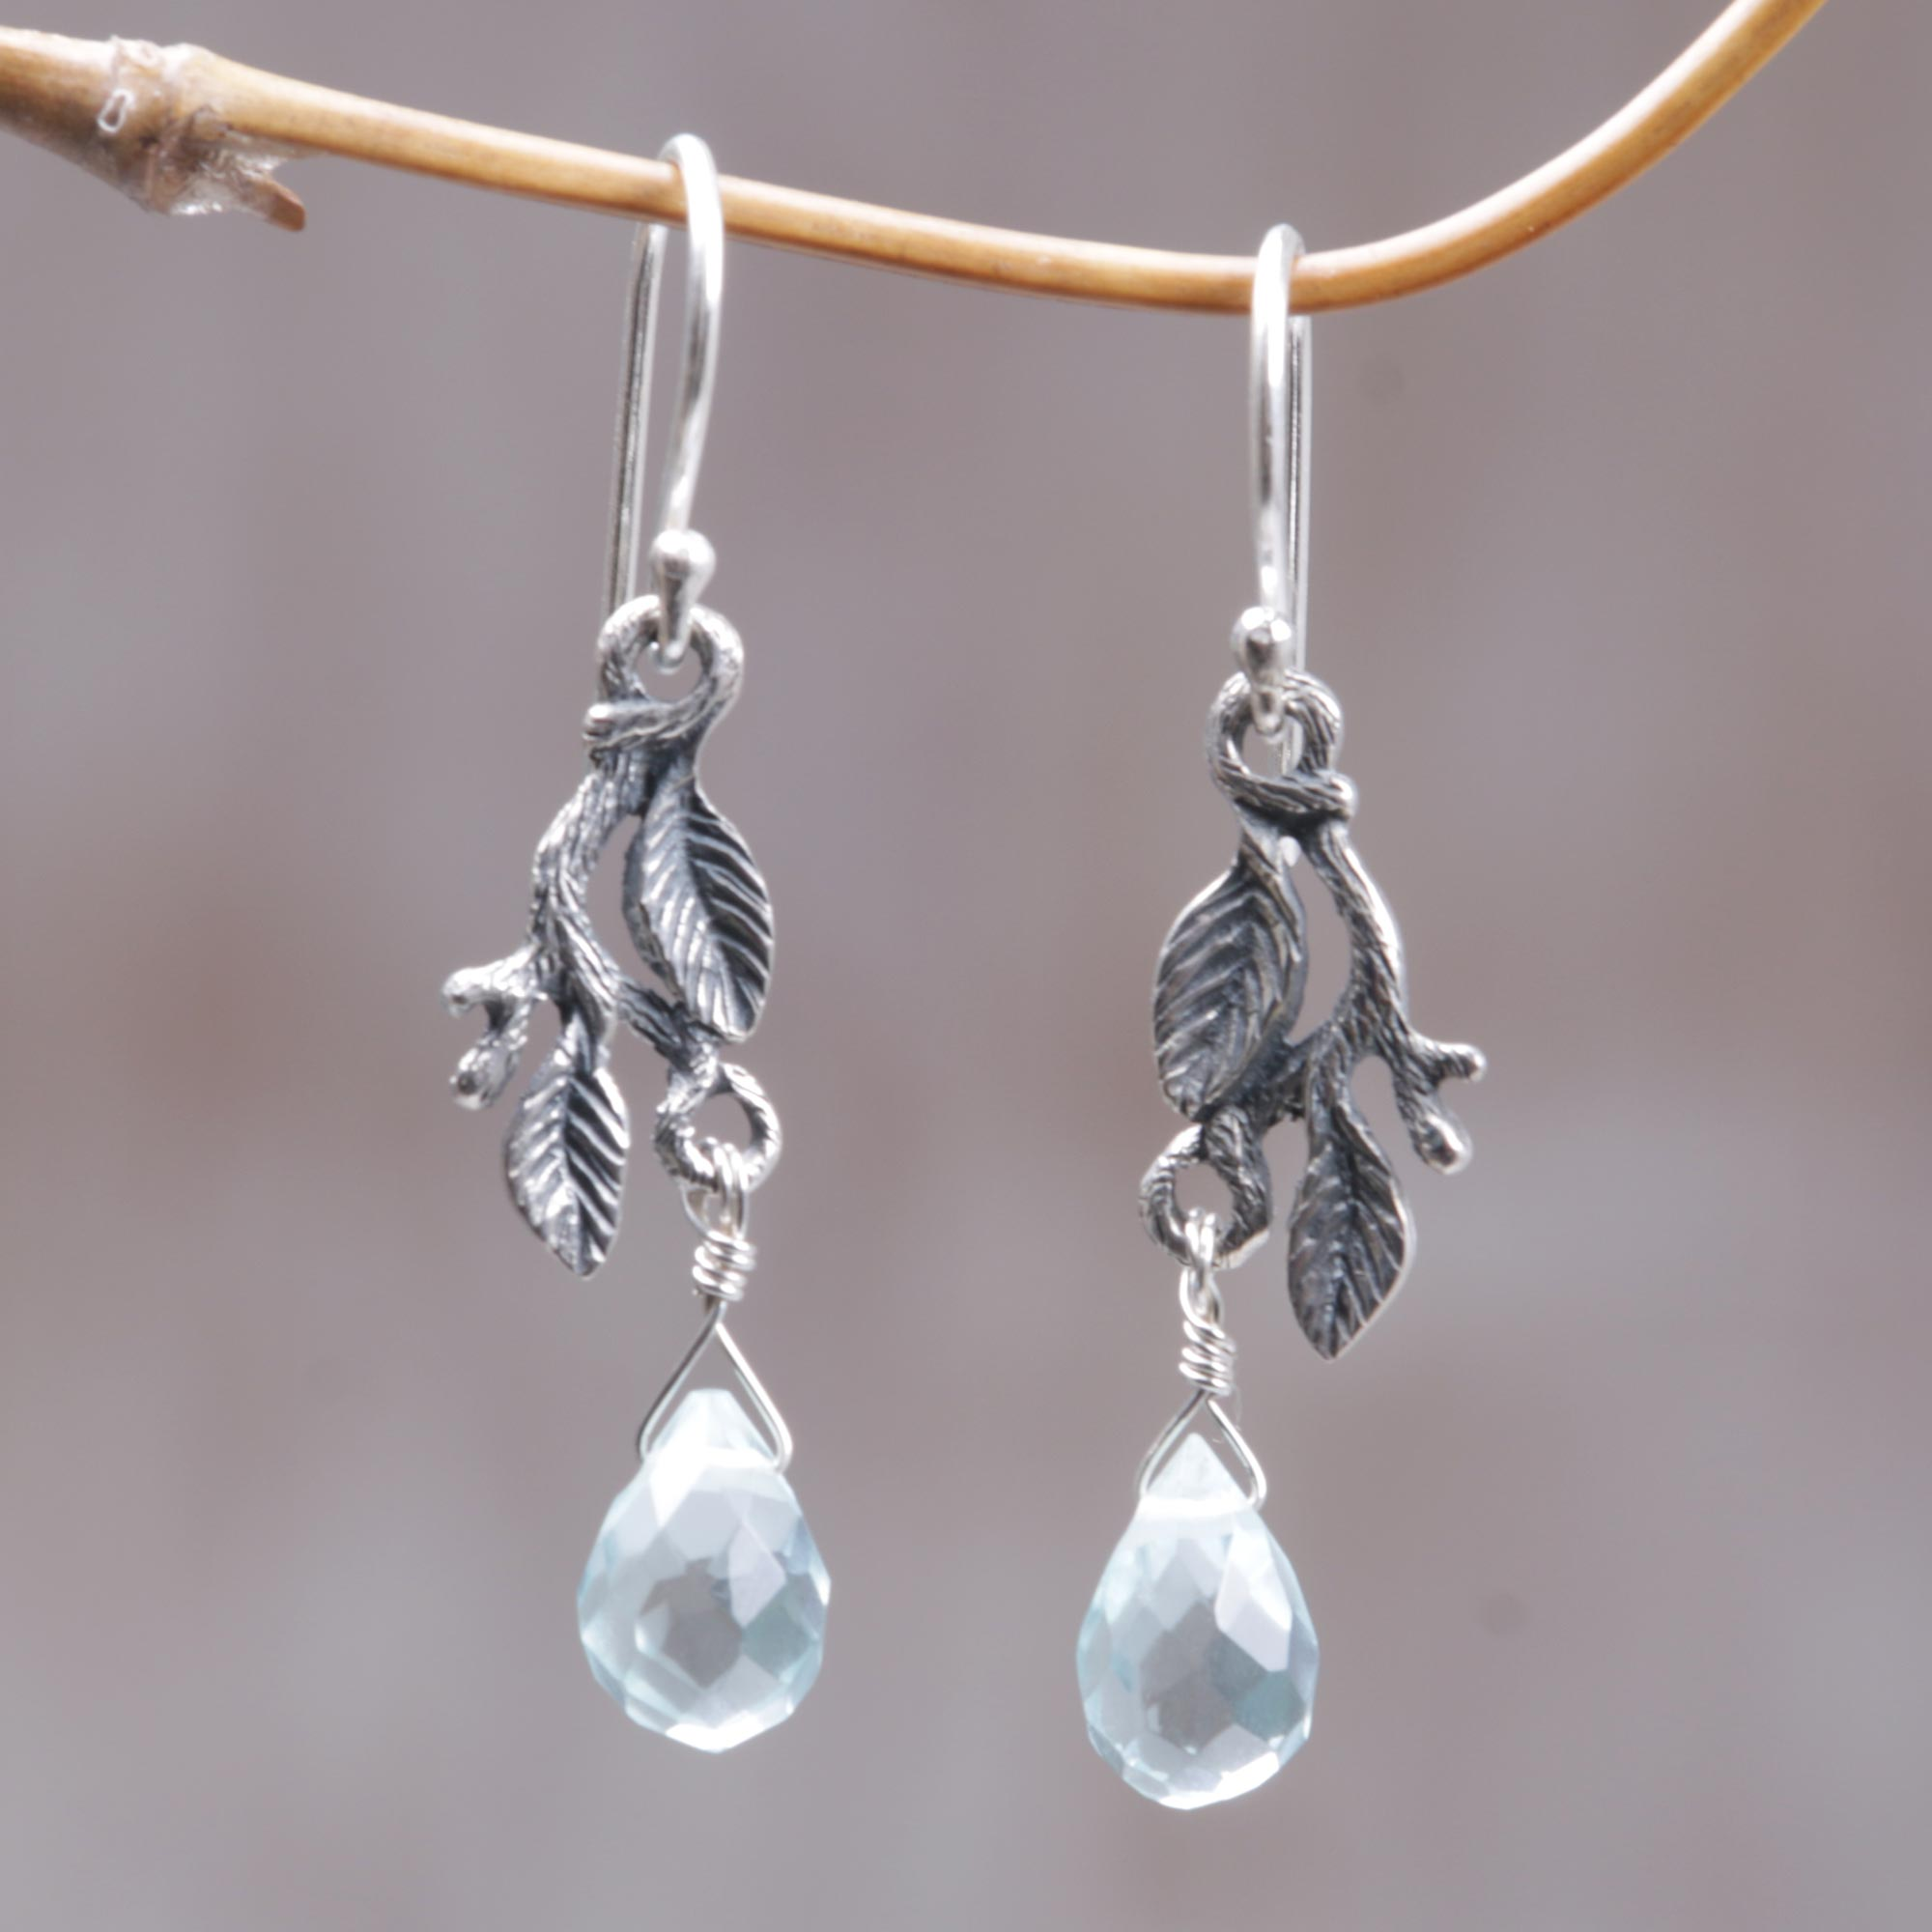 unicef uk market handmade sterling silver dangle